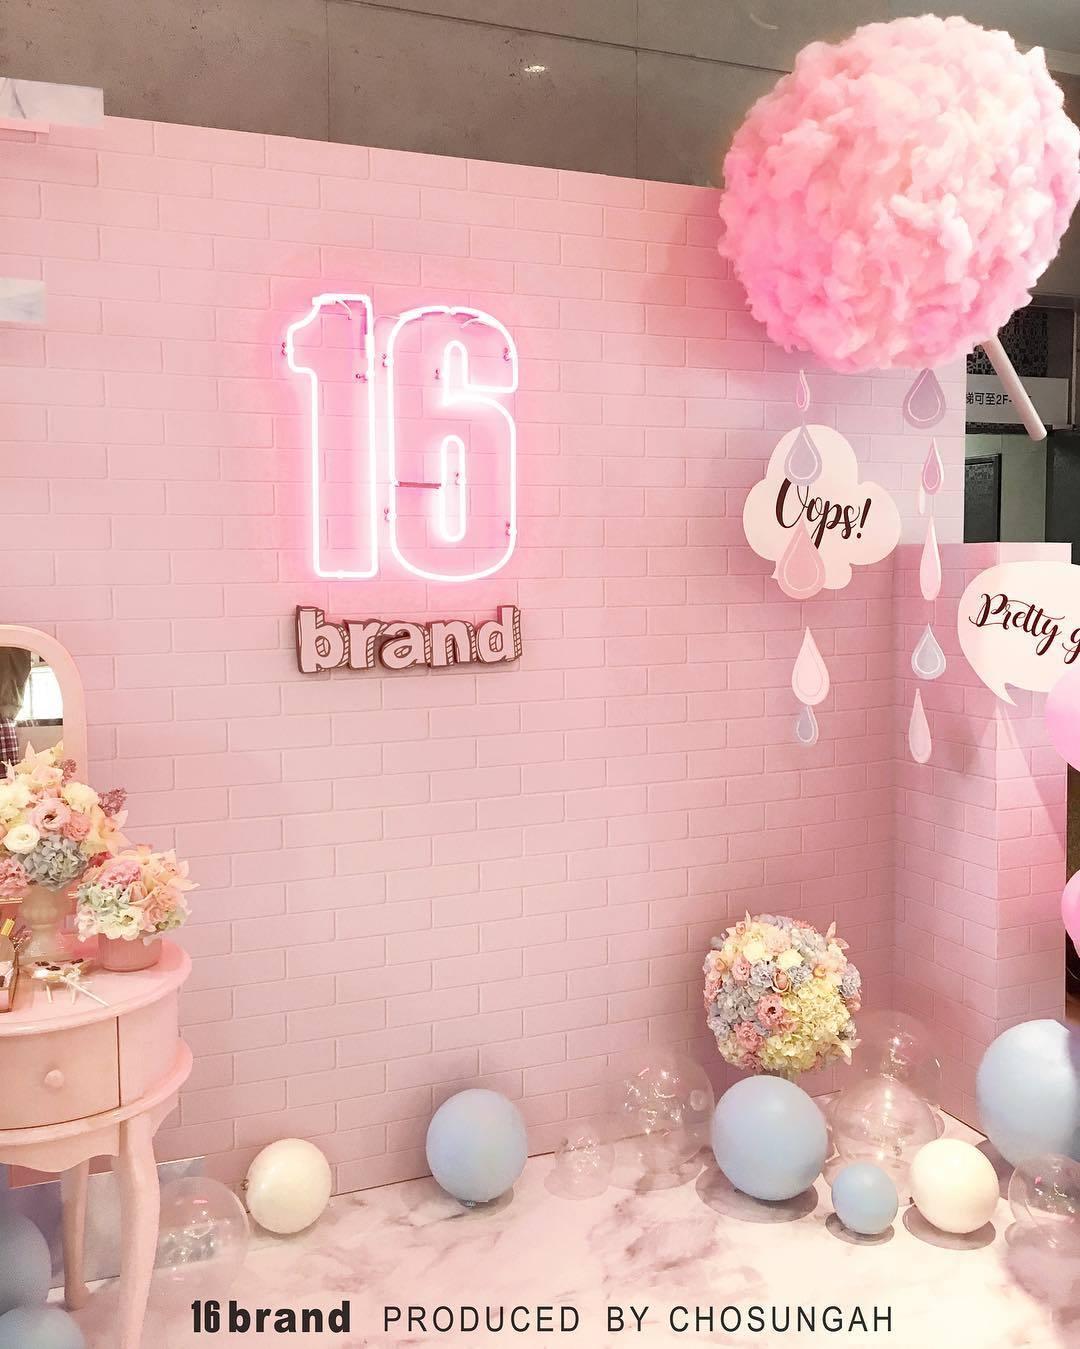 16-brand-thuong-hieu-my-pham-han